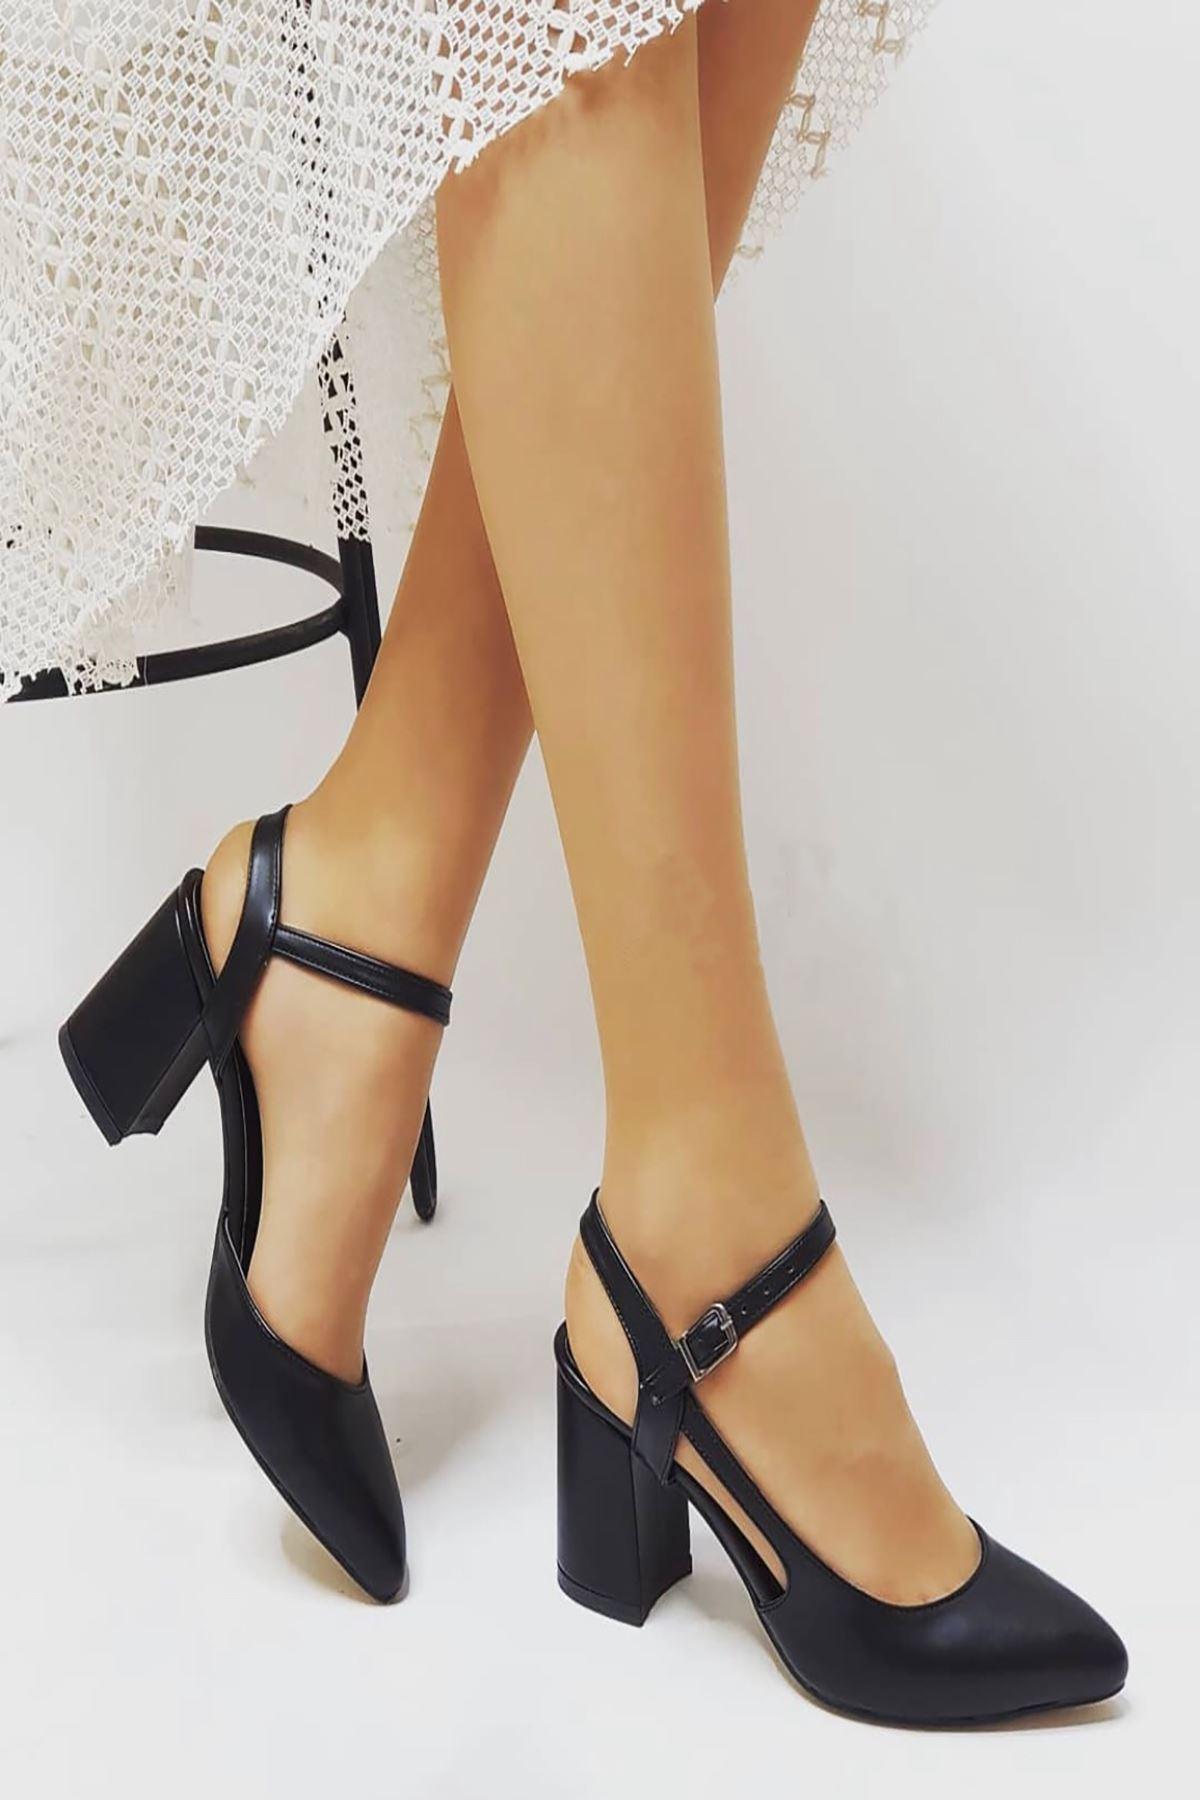 Y104 Siyah Deri Topuklu Ayakkabı